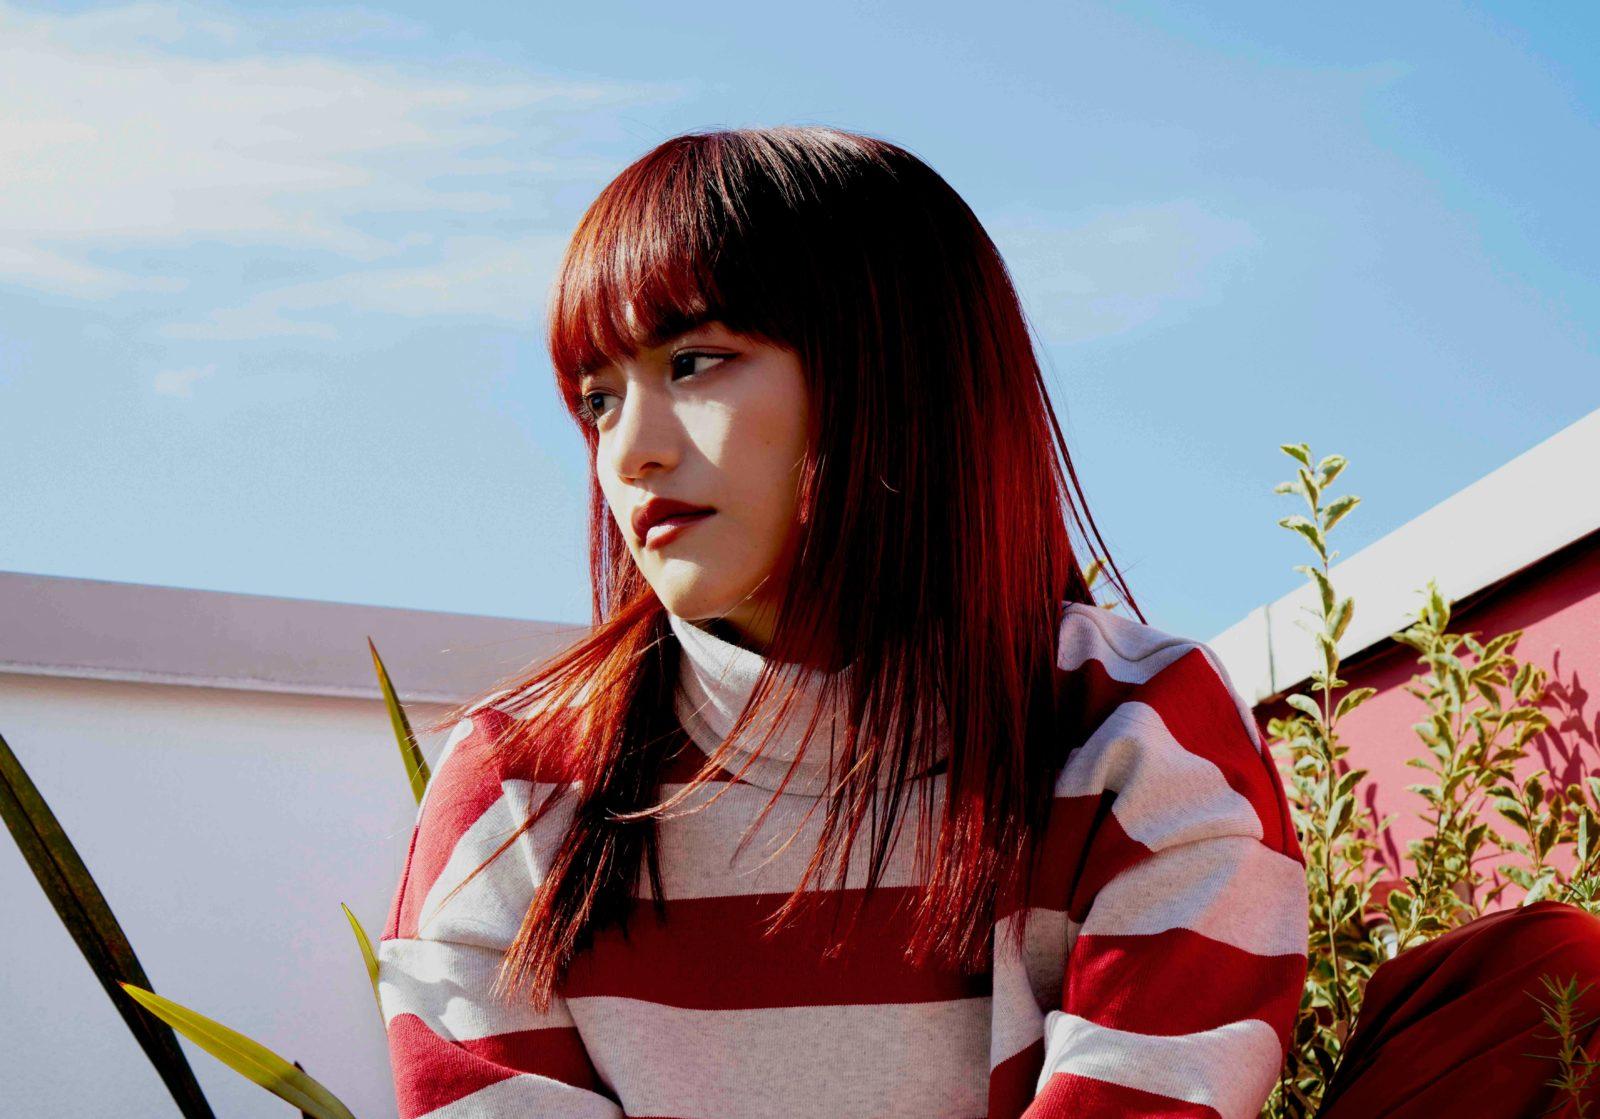 iri、話題のティザー映像に続き「24-25」ミュージックビデオ公開サムネイル画像